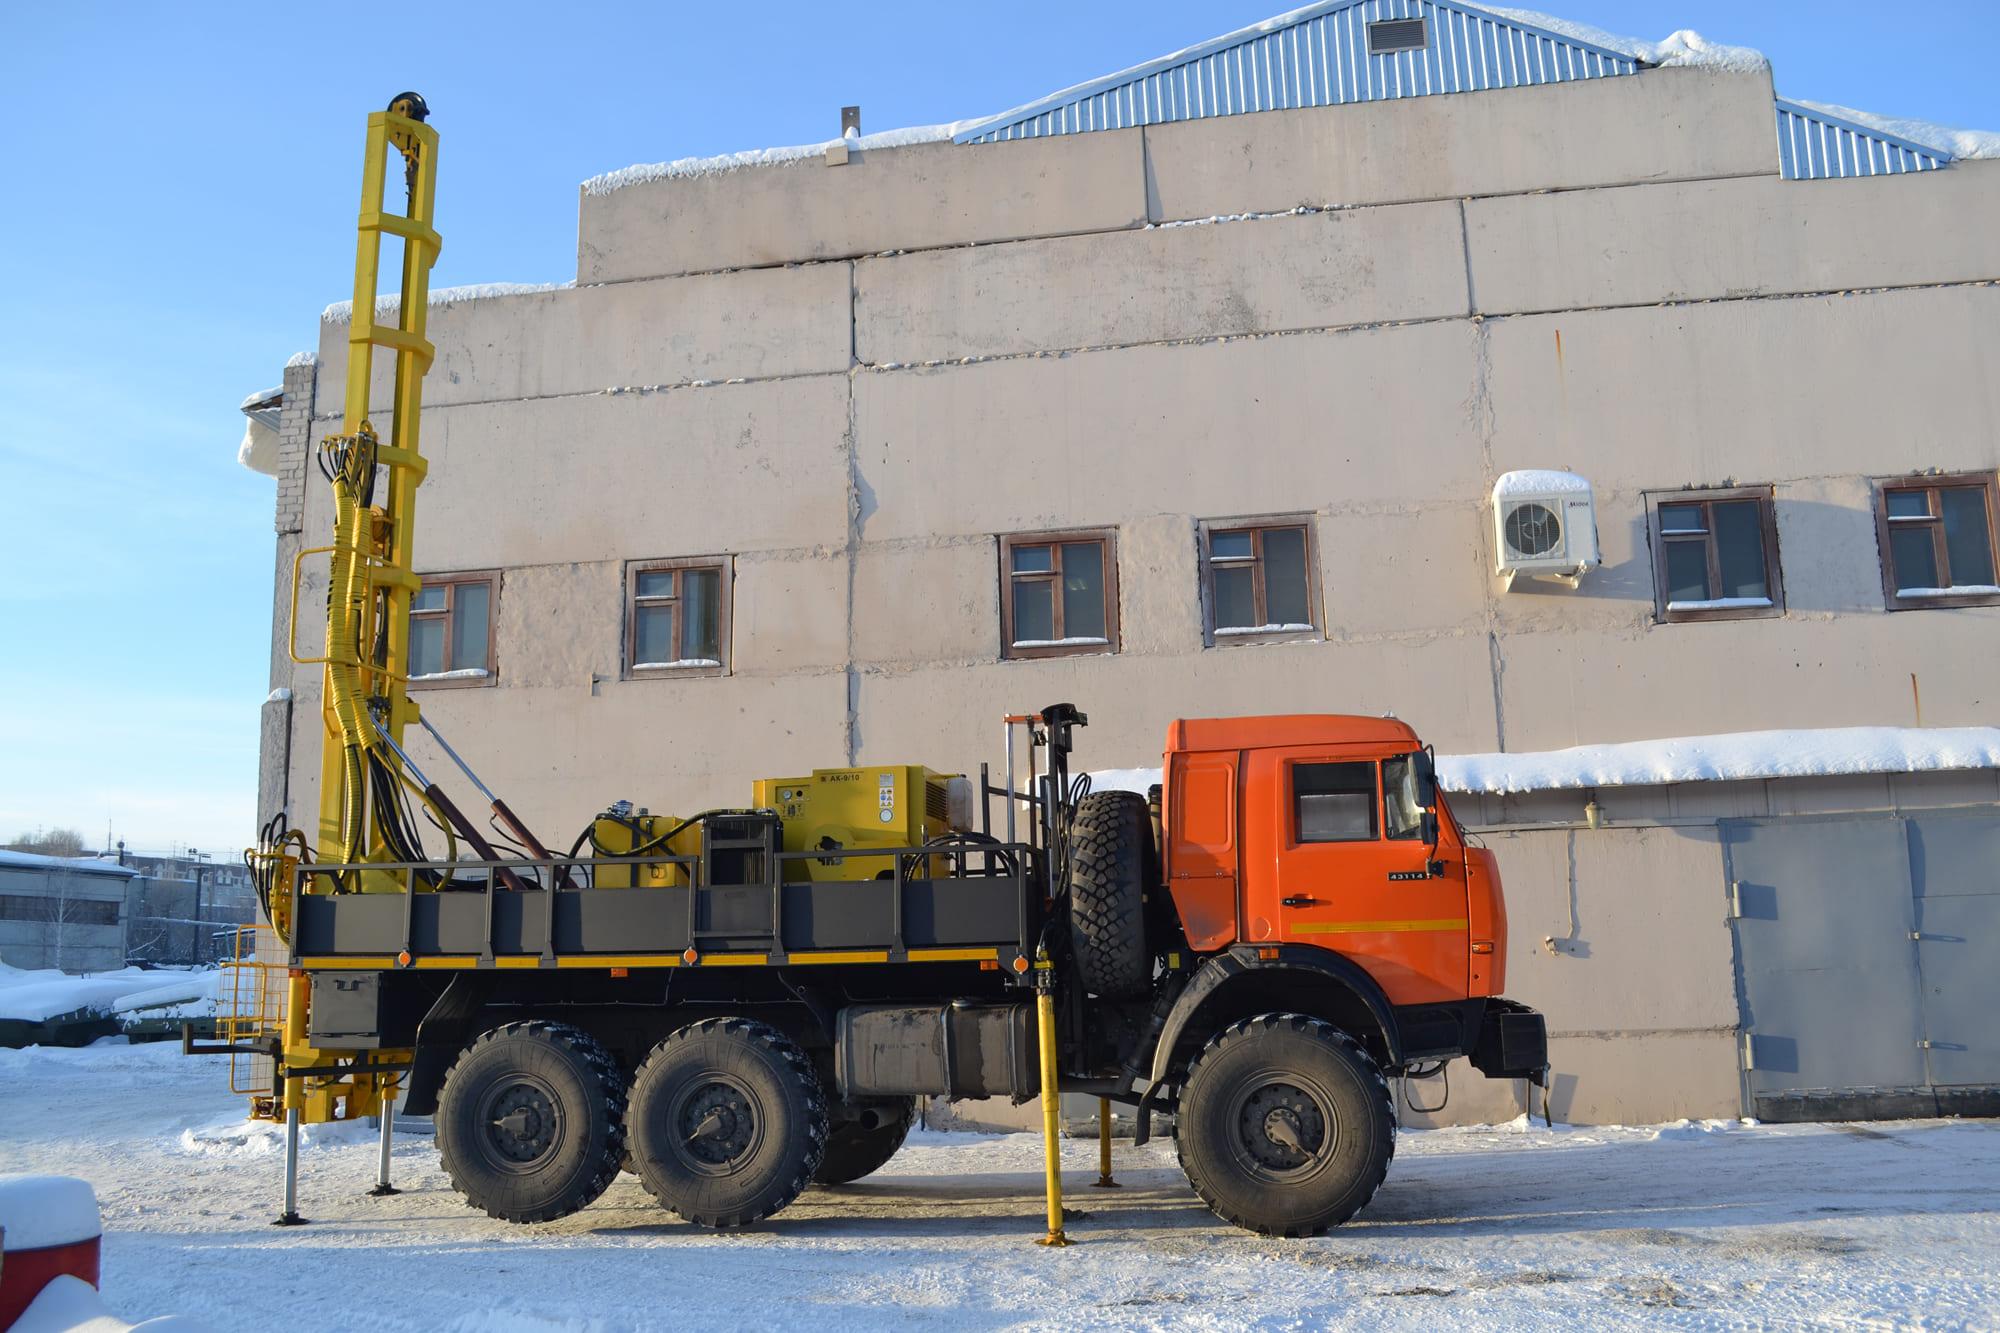 Установка буровая гидромеханизированная УБГМ-1Д на базе КАМАЗ 43114, 43118